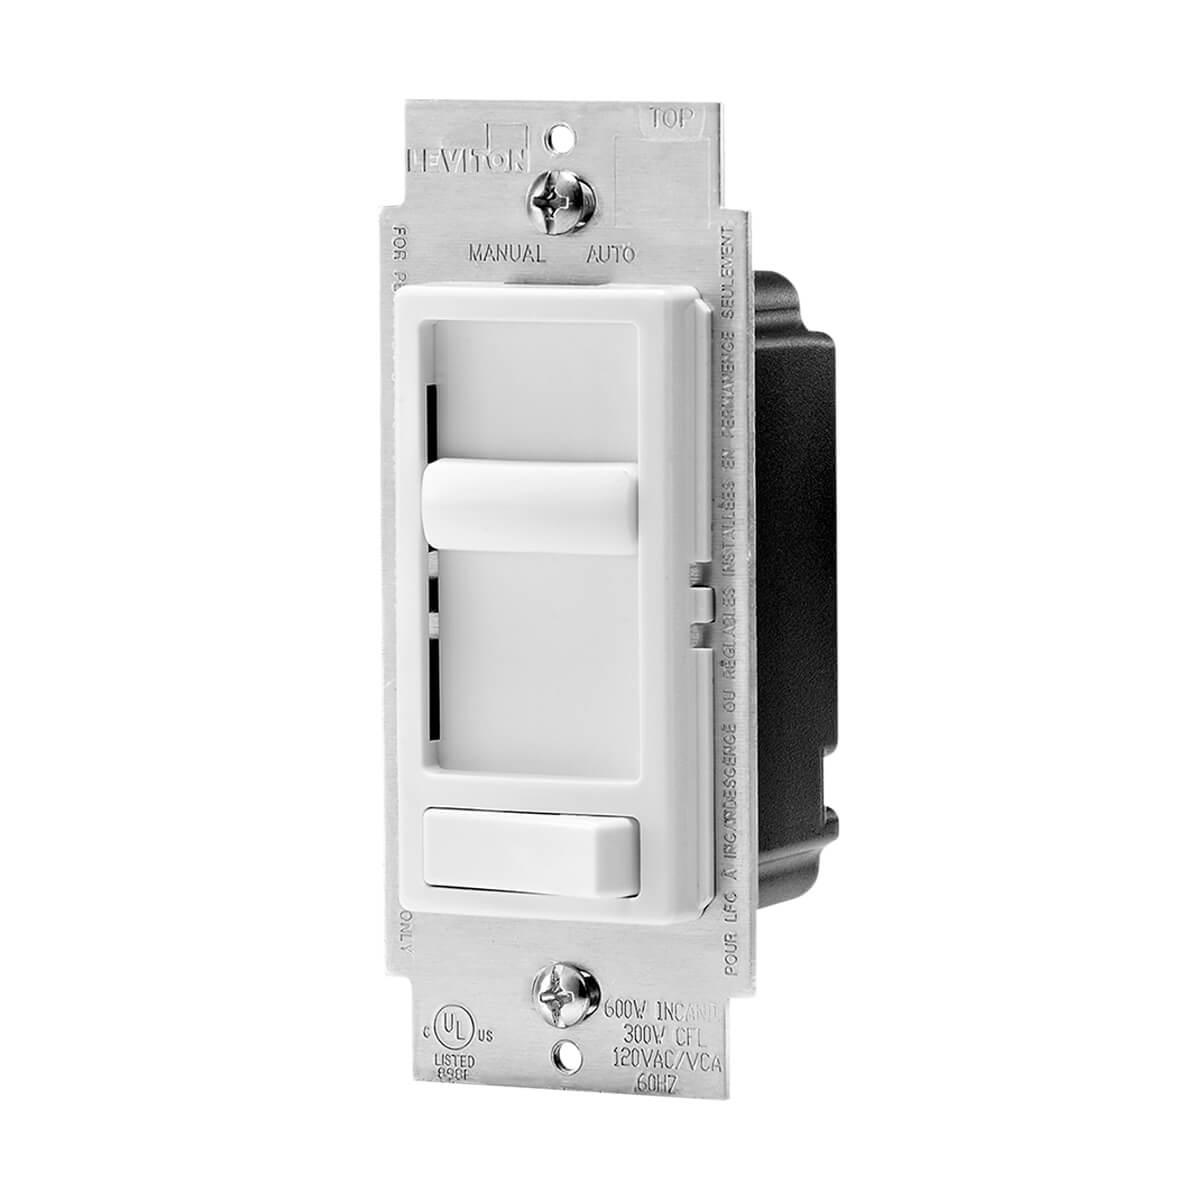 Leviton® Decora Universal LED Dimmer - White